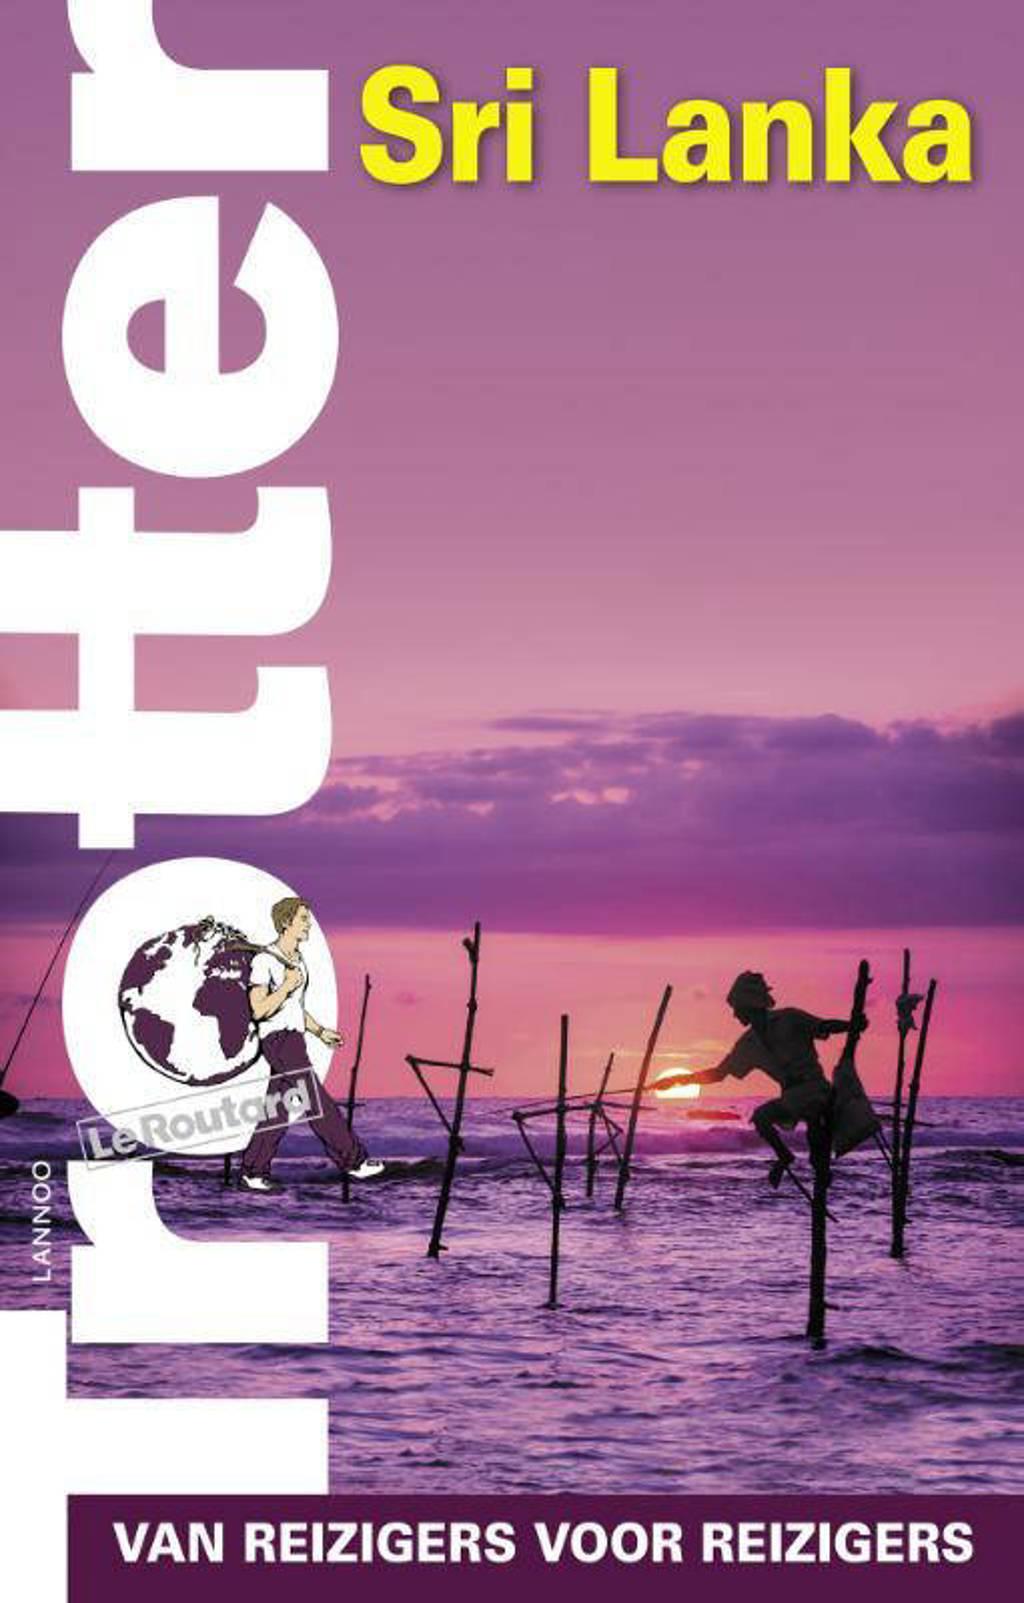 Trotter: Sri Lanka